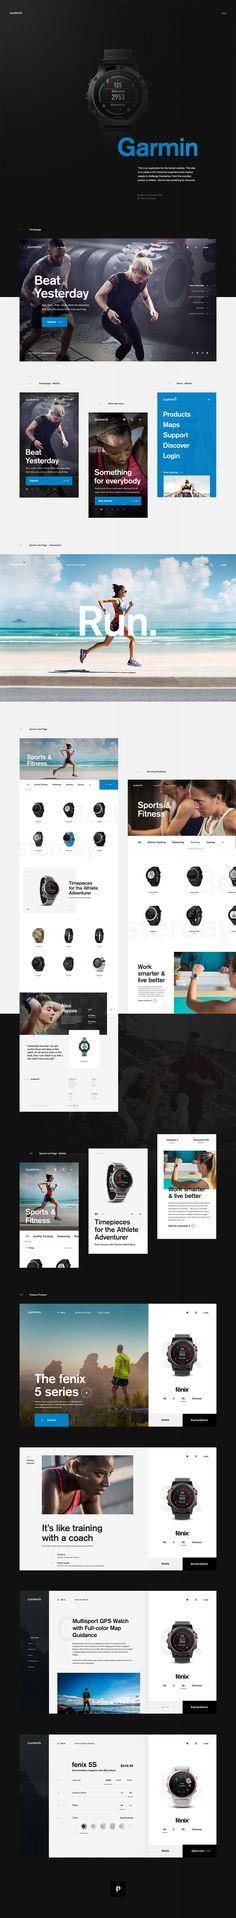 Garmin Web Exploration  #ui #webdesign #concept #minimal #inspiration #garmin #fitness #interactive #userexperience #motion #simple #watch #behance #dribbble #mobile